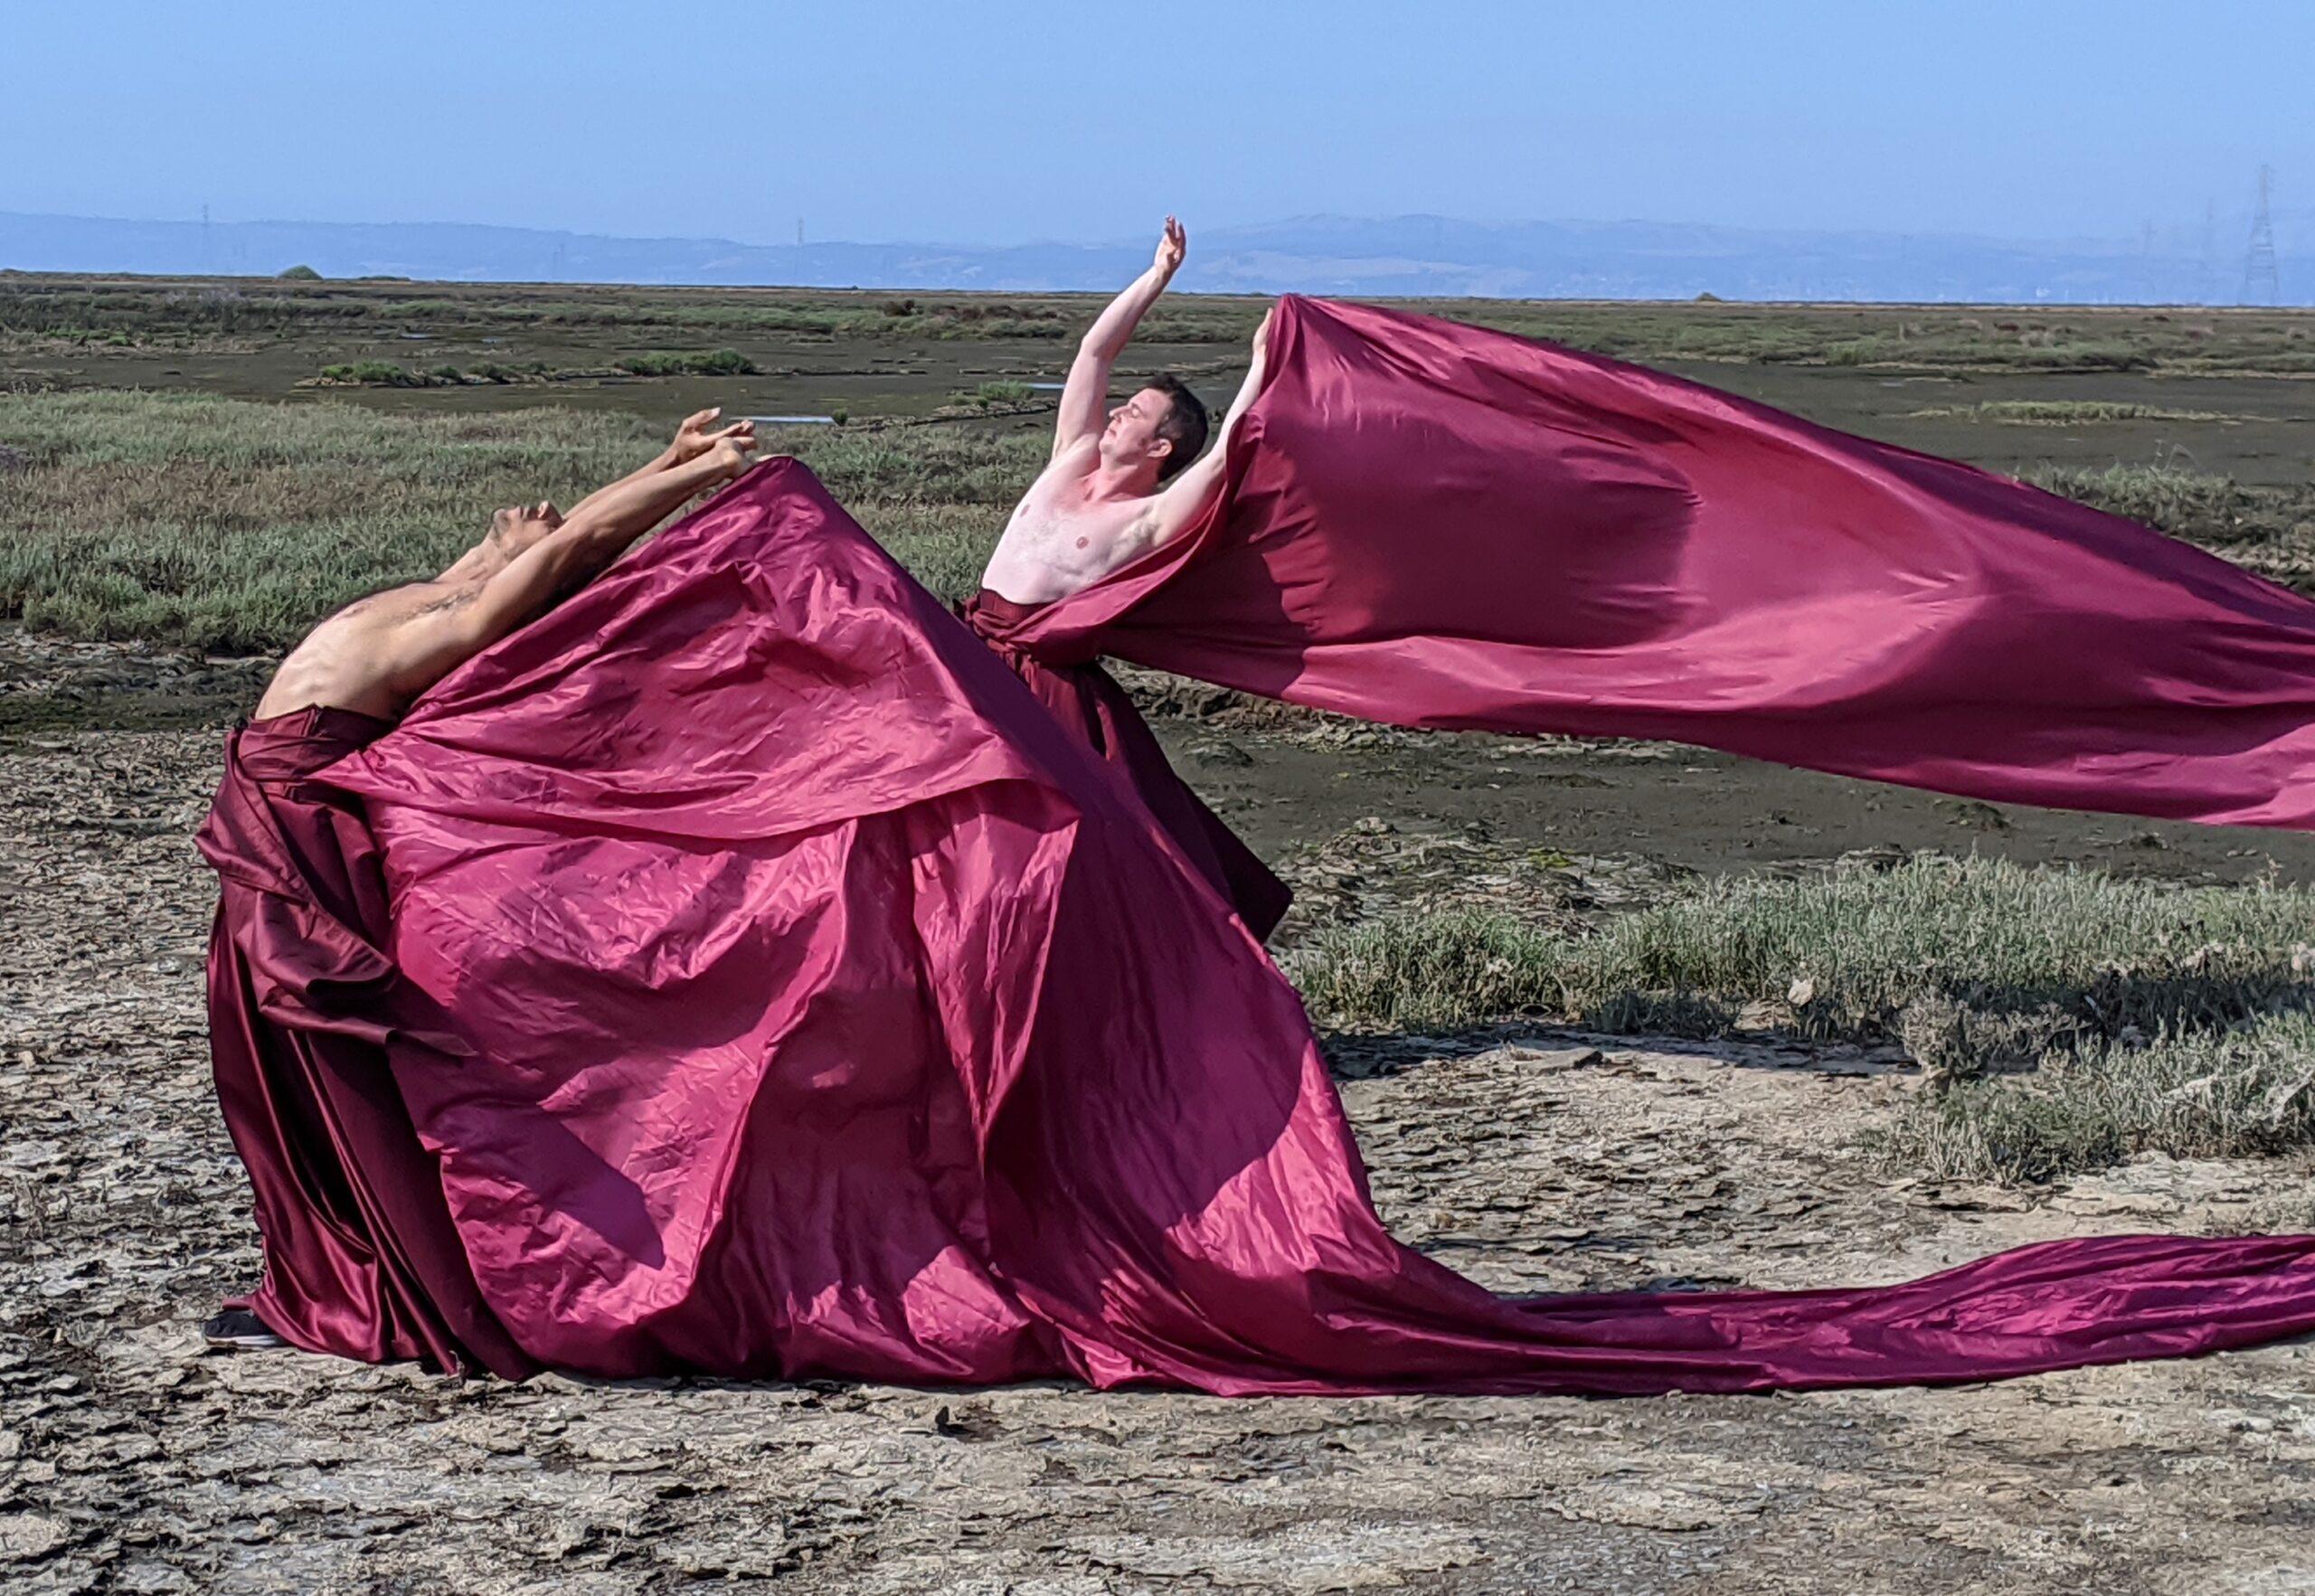 48hills.org: Sean Dorsey Dance premieres nine 'gorgeous' new films in AT-HOME season